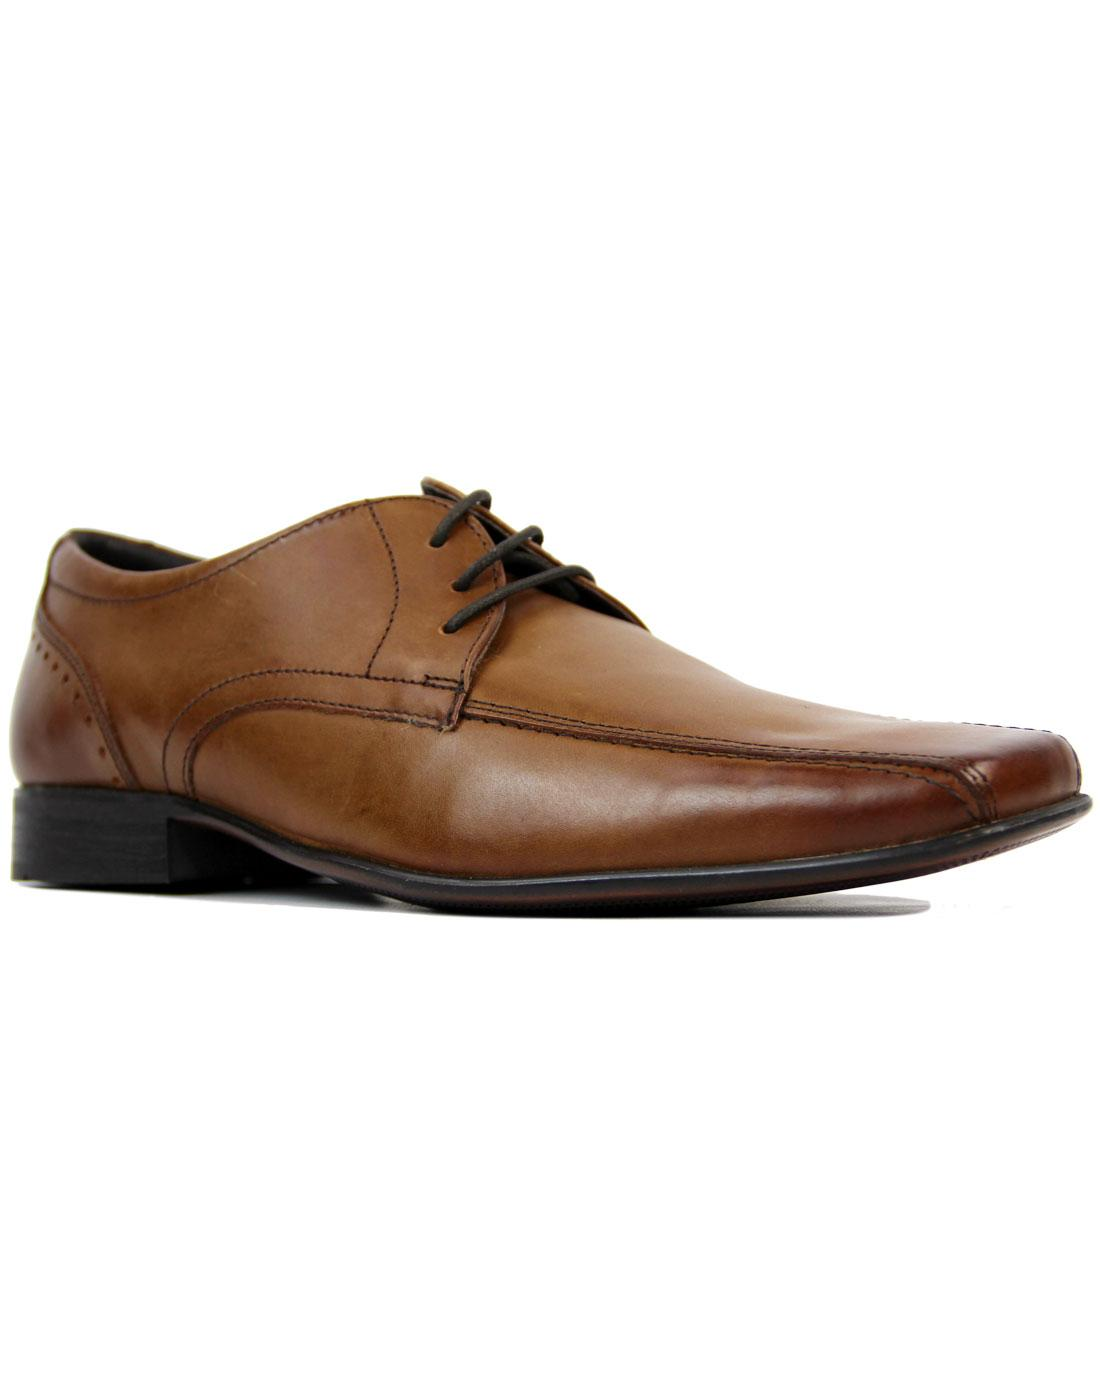 Fraser IKON Retro Mod Leather Chisel Toe Shoes TAN